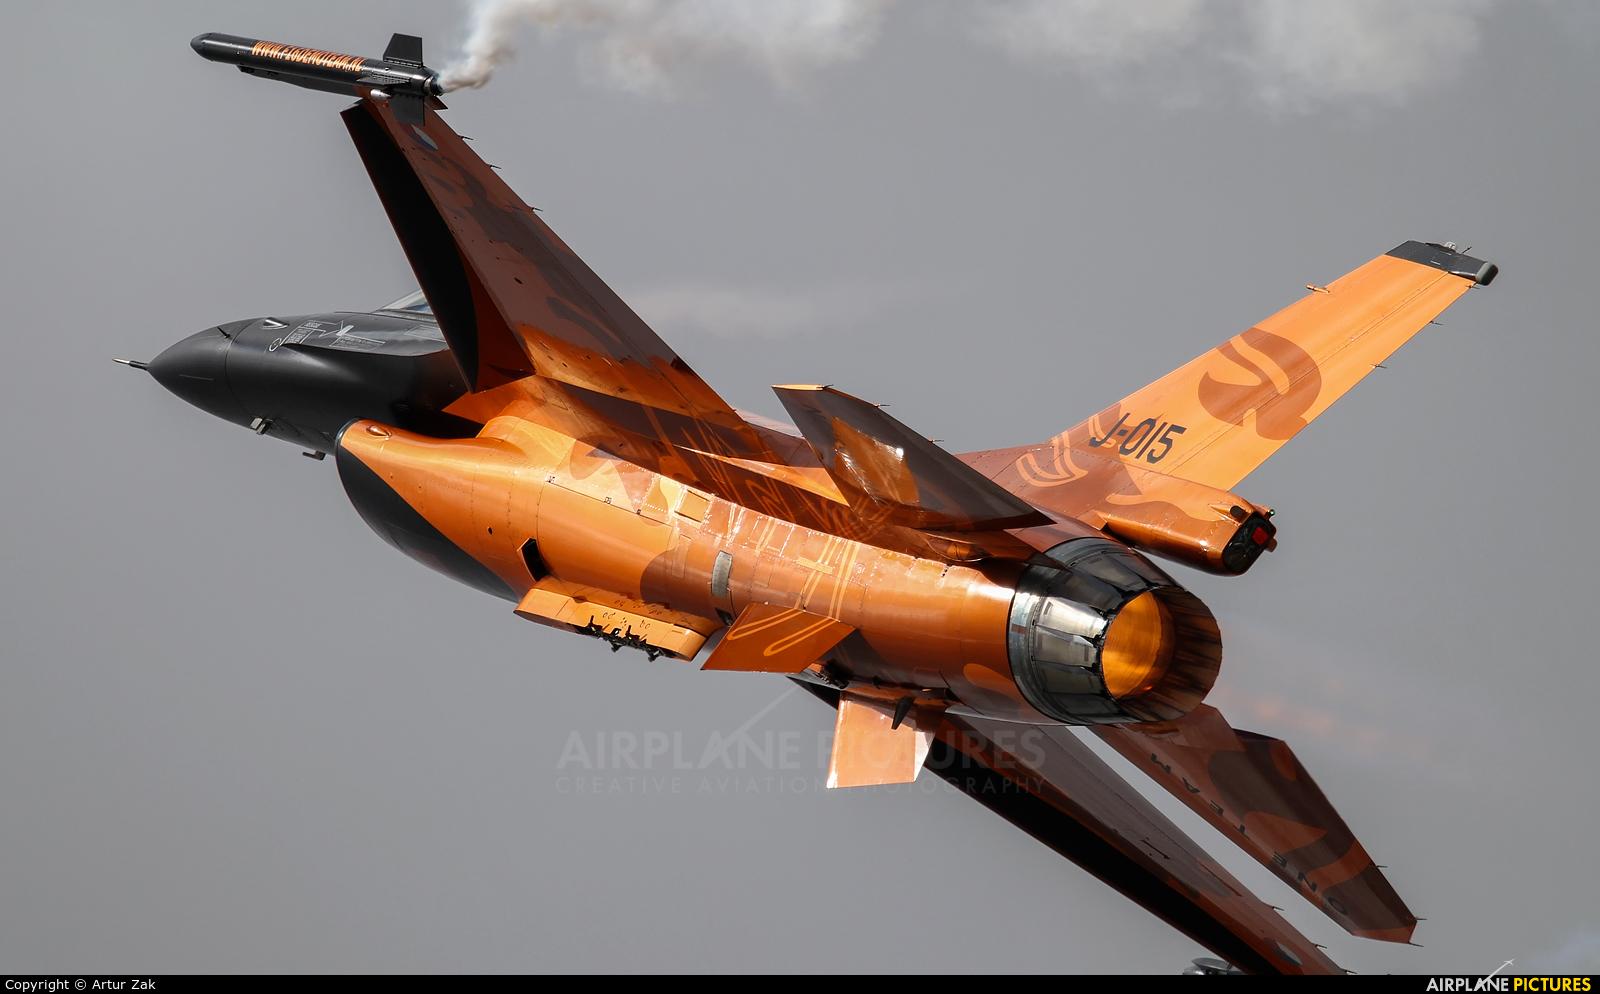 Netherlands - Air Force J-015 aircraft at Fairford